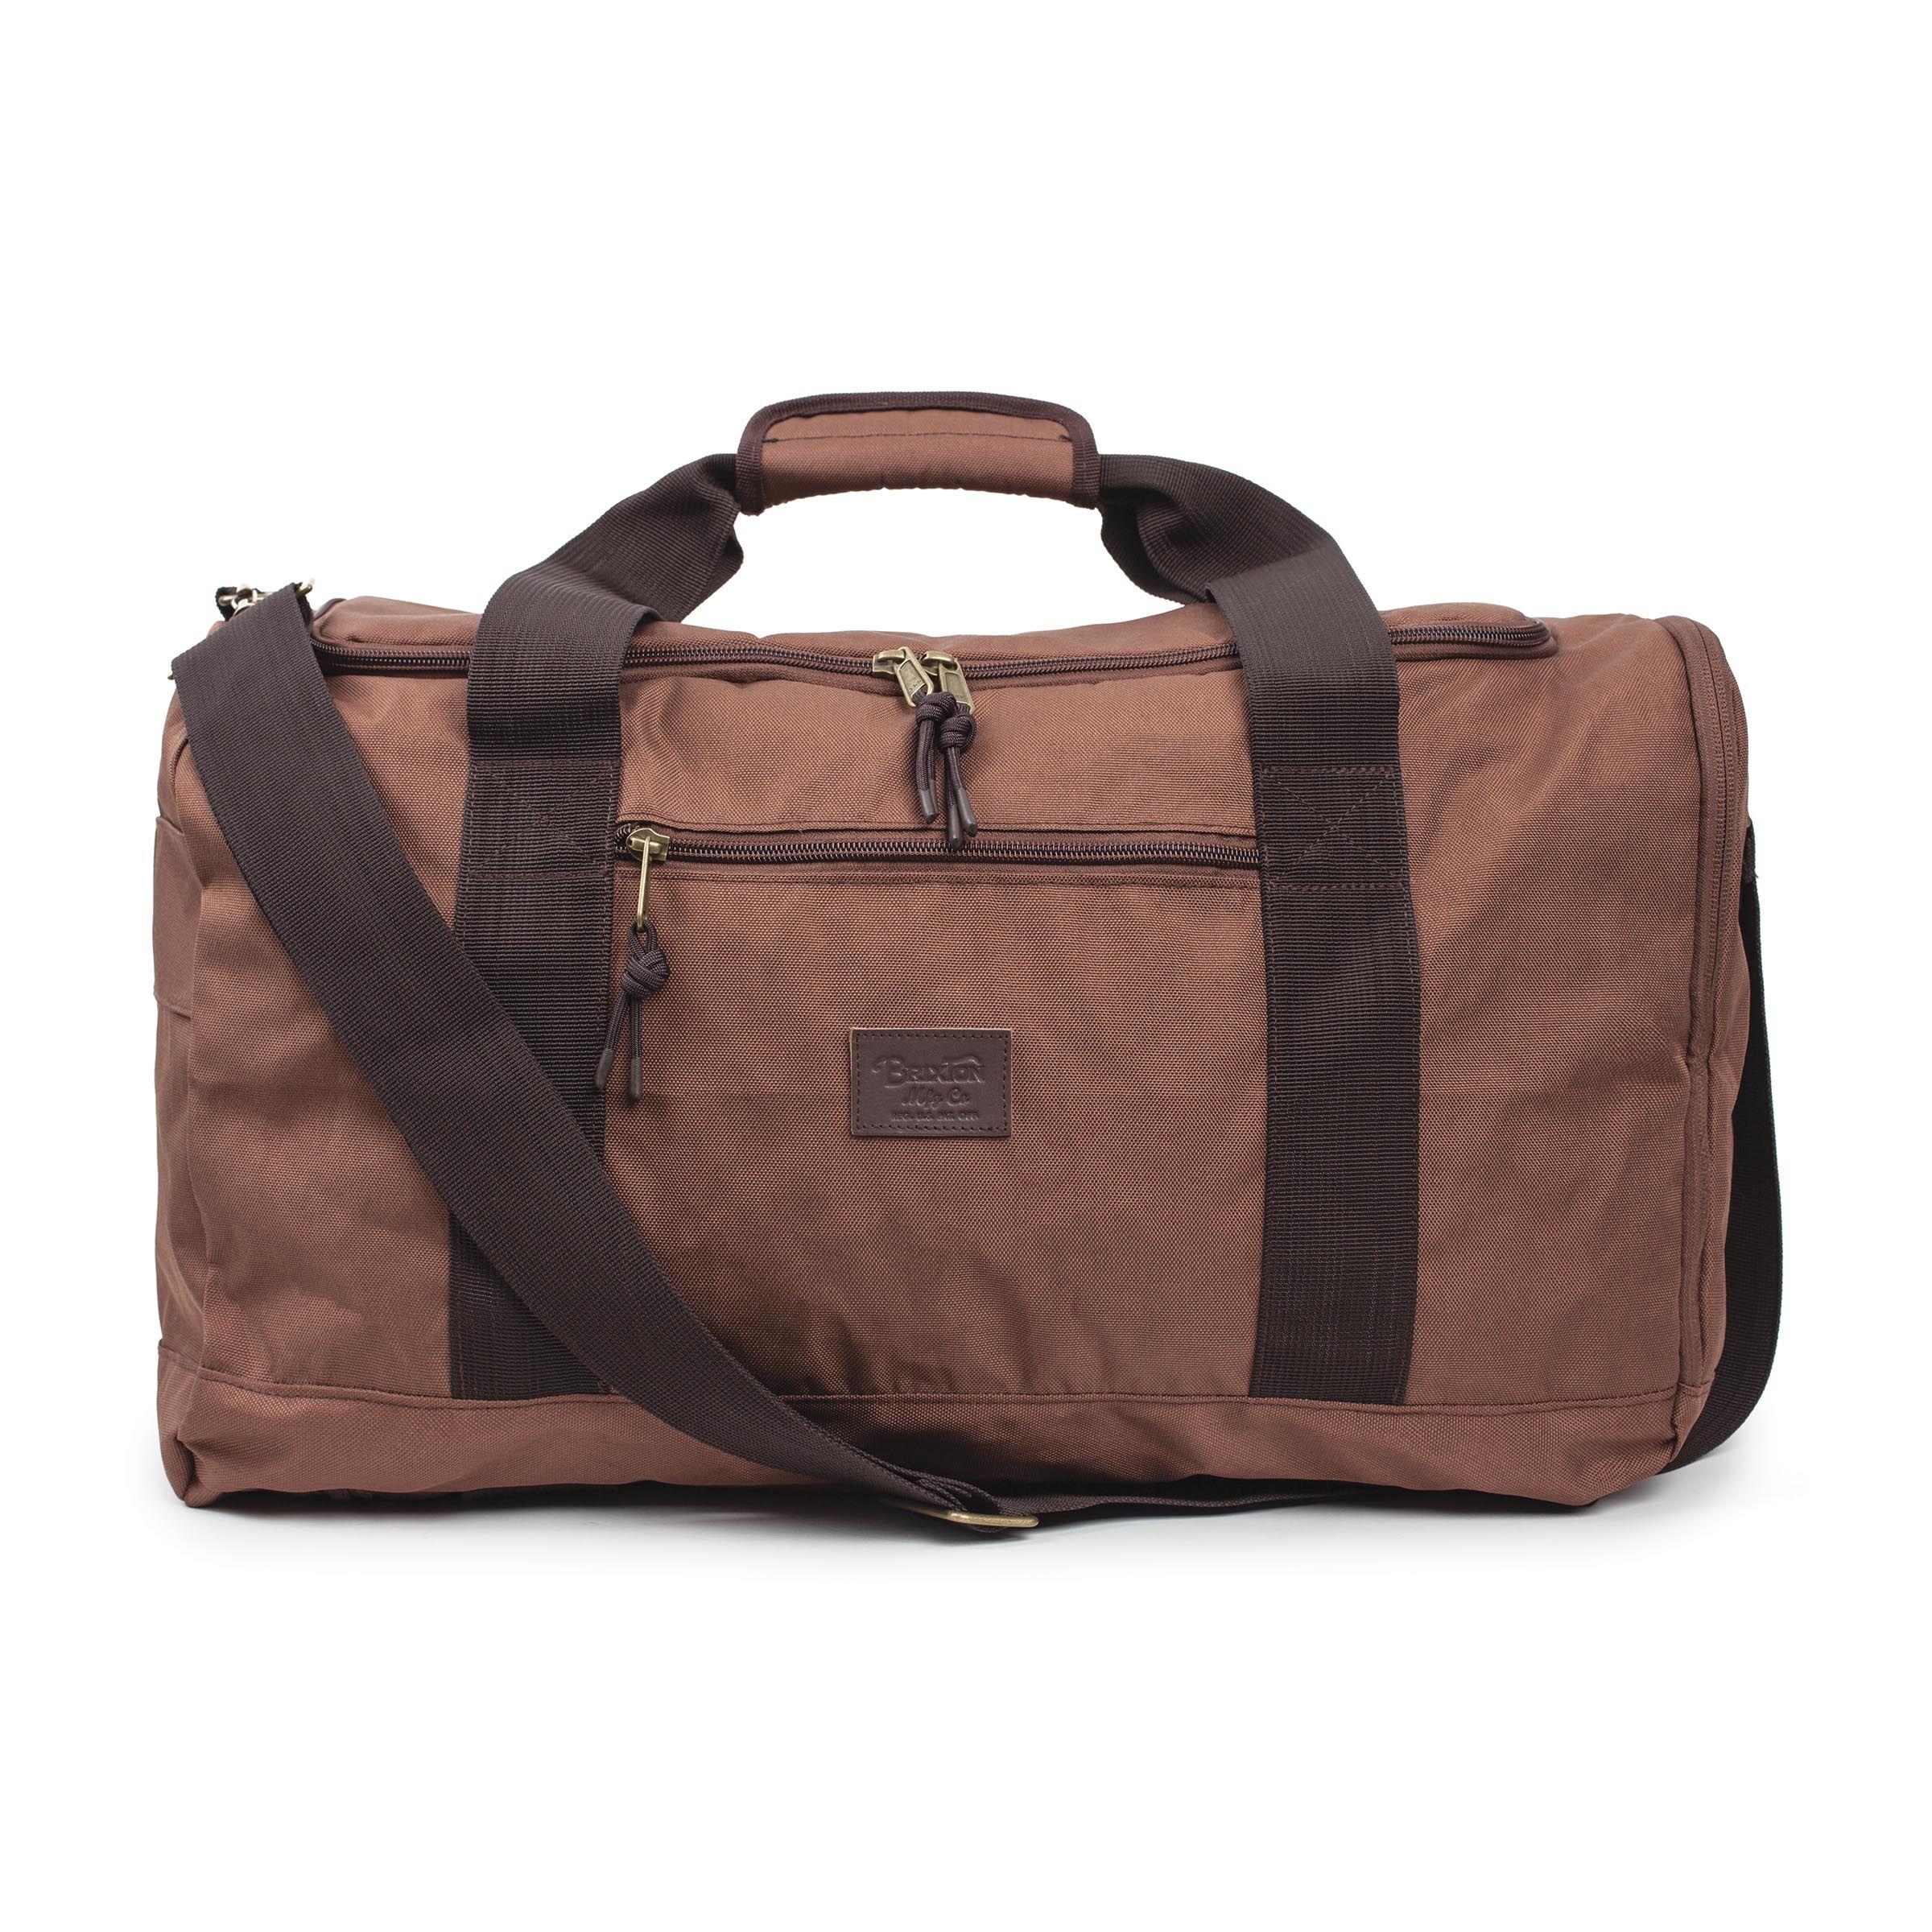 Brixton Packer Bag Brown - Boardvillage b421ea83c1